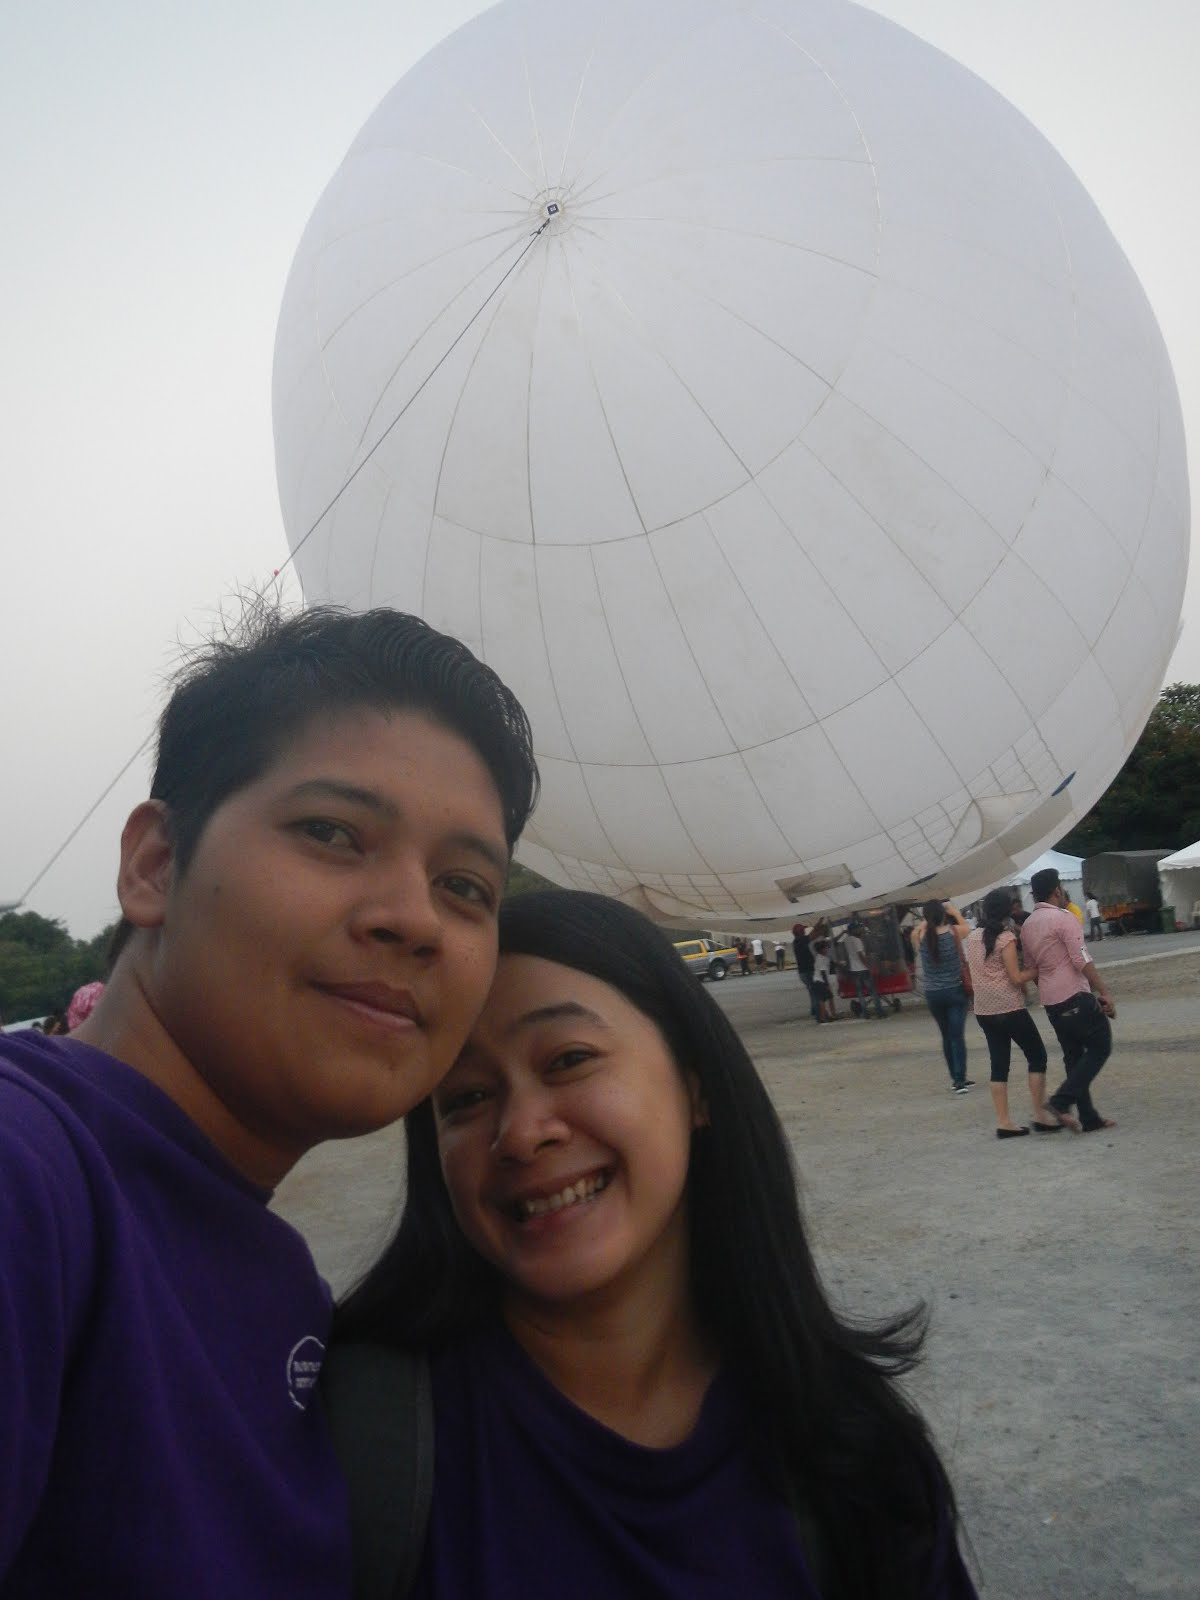 7th Putrajaya International Hot Air Balloon Fiesta 2015